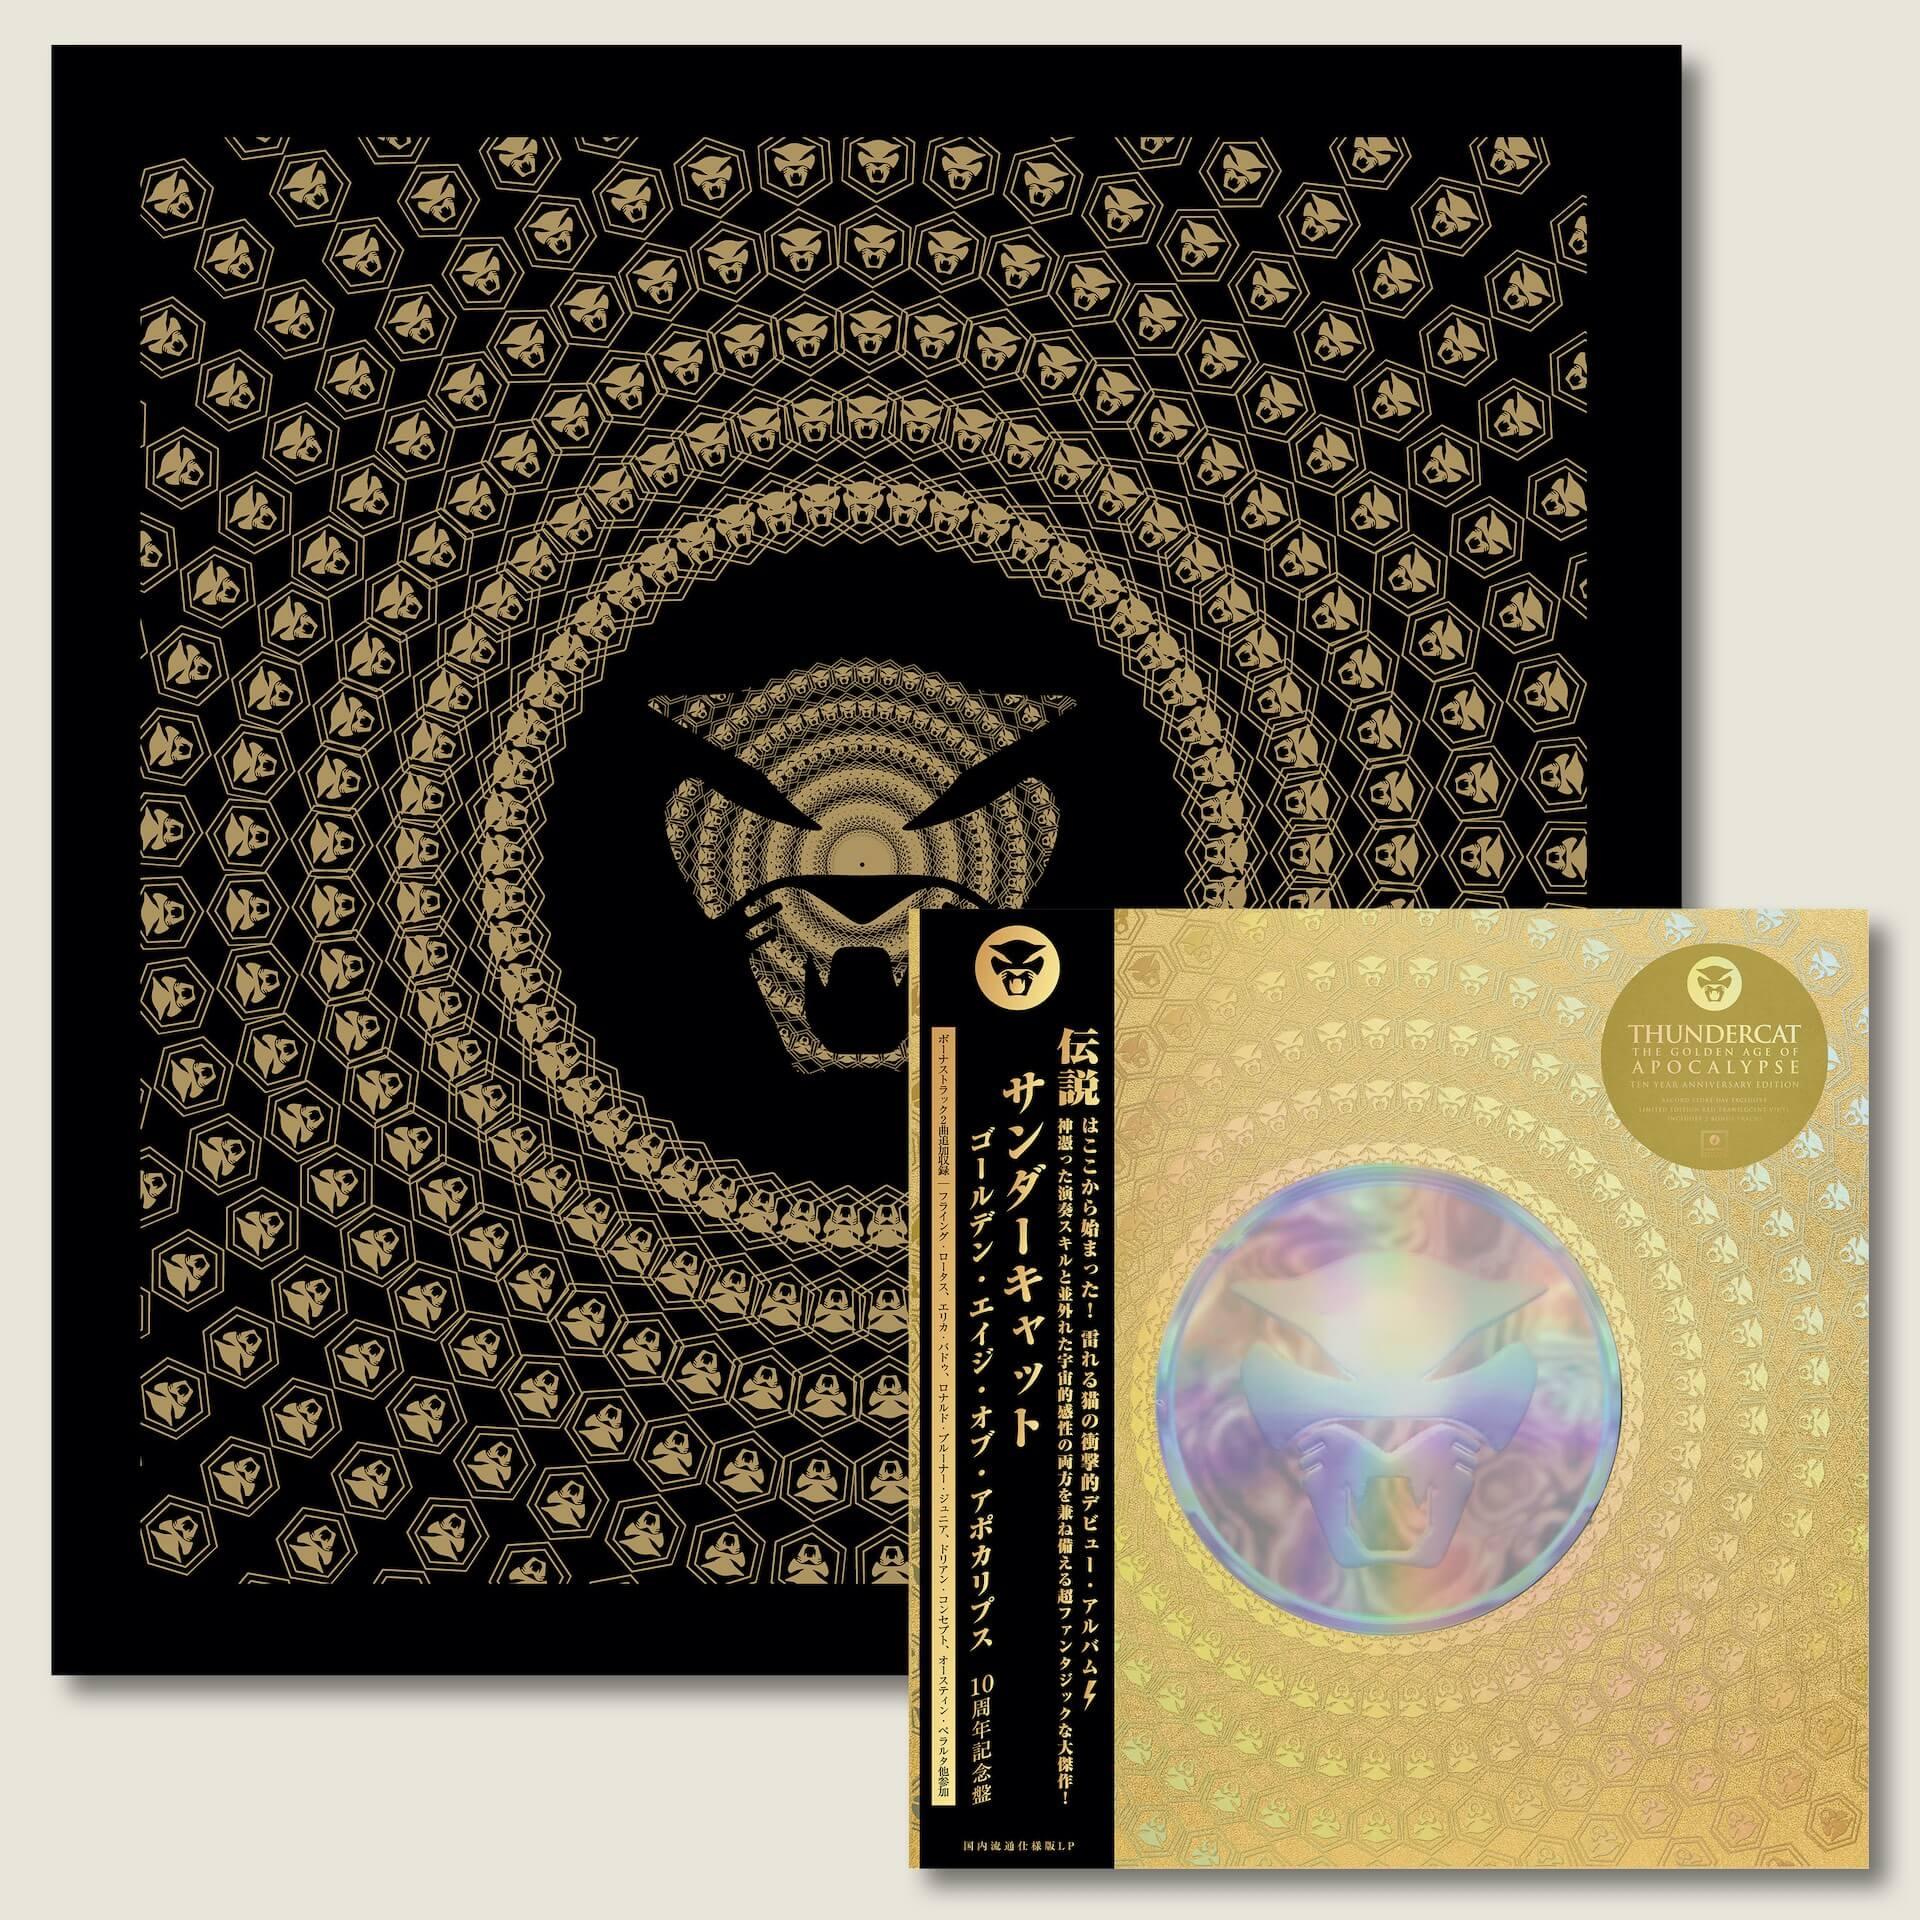 Thundercat『Golden Age of Apocalypse』10周年記念盤がリリース決定!Flying Lotusプロデュースの傑作 music210916_thunder_cat-05